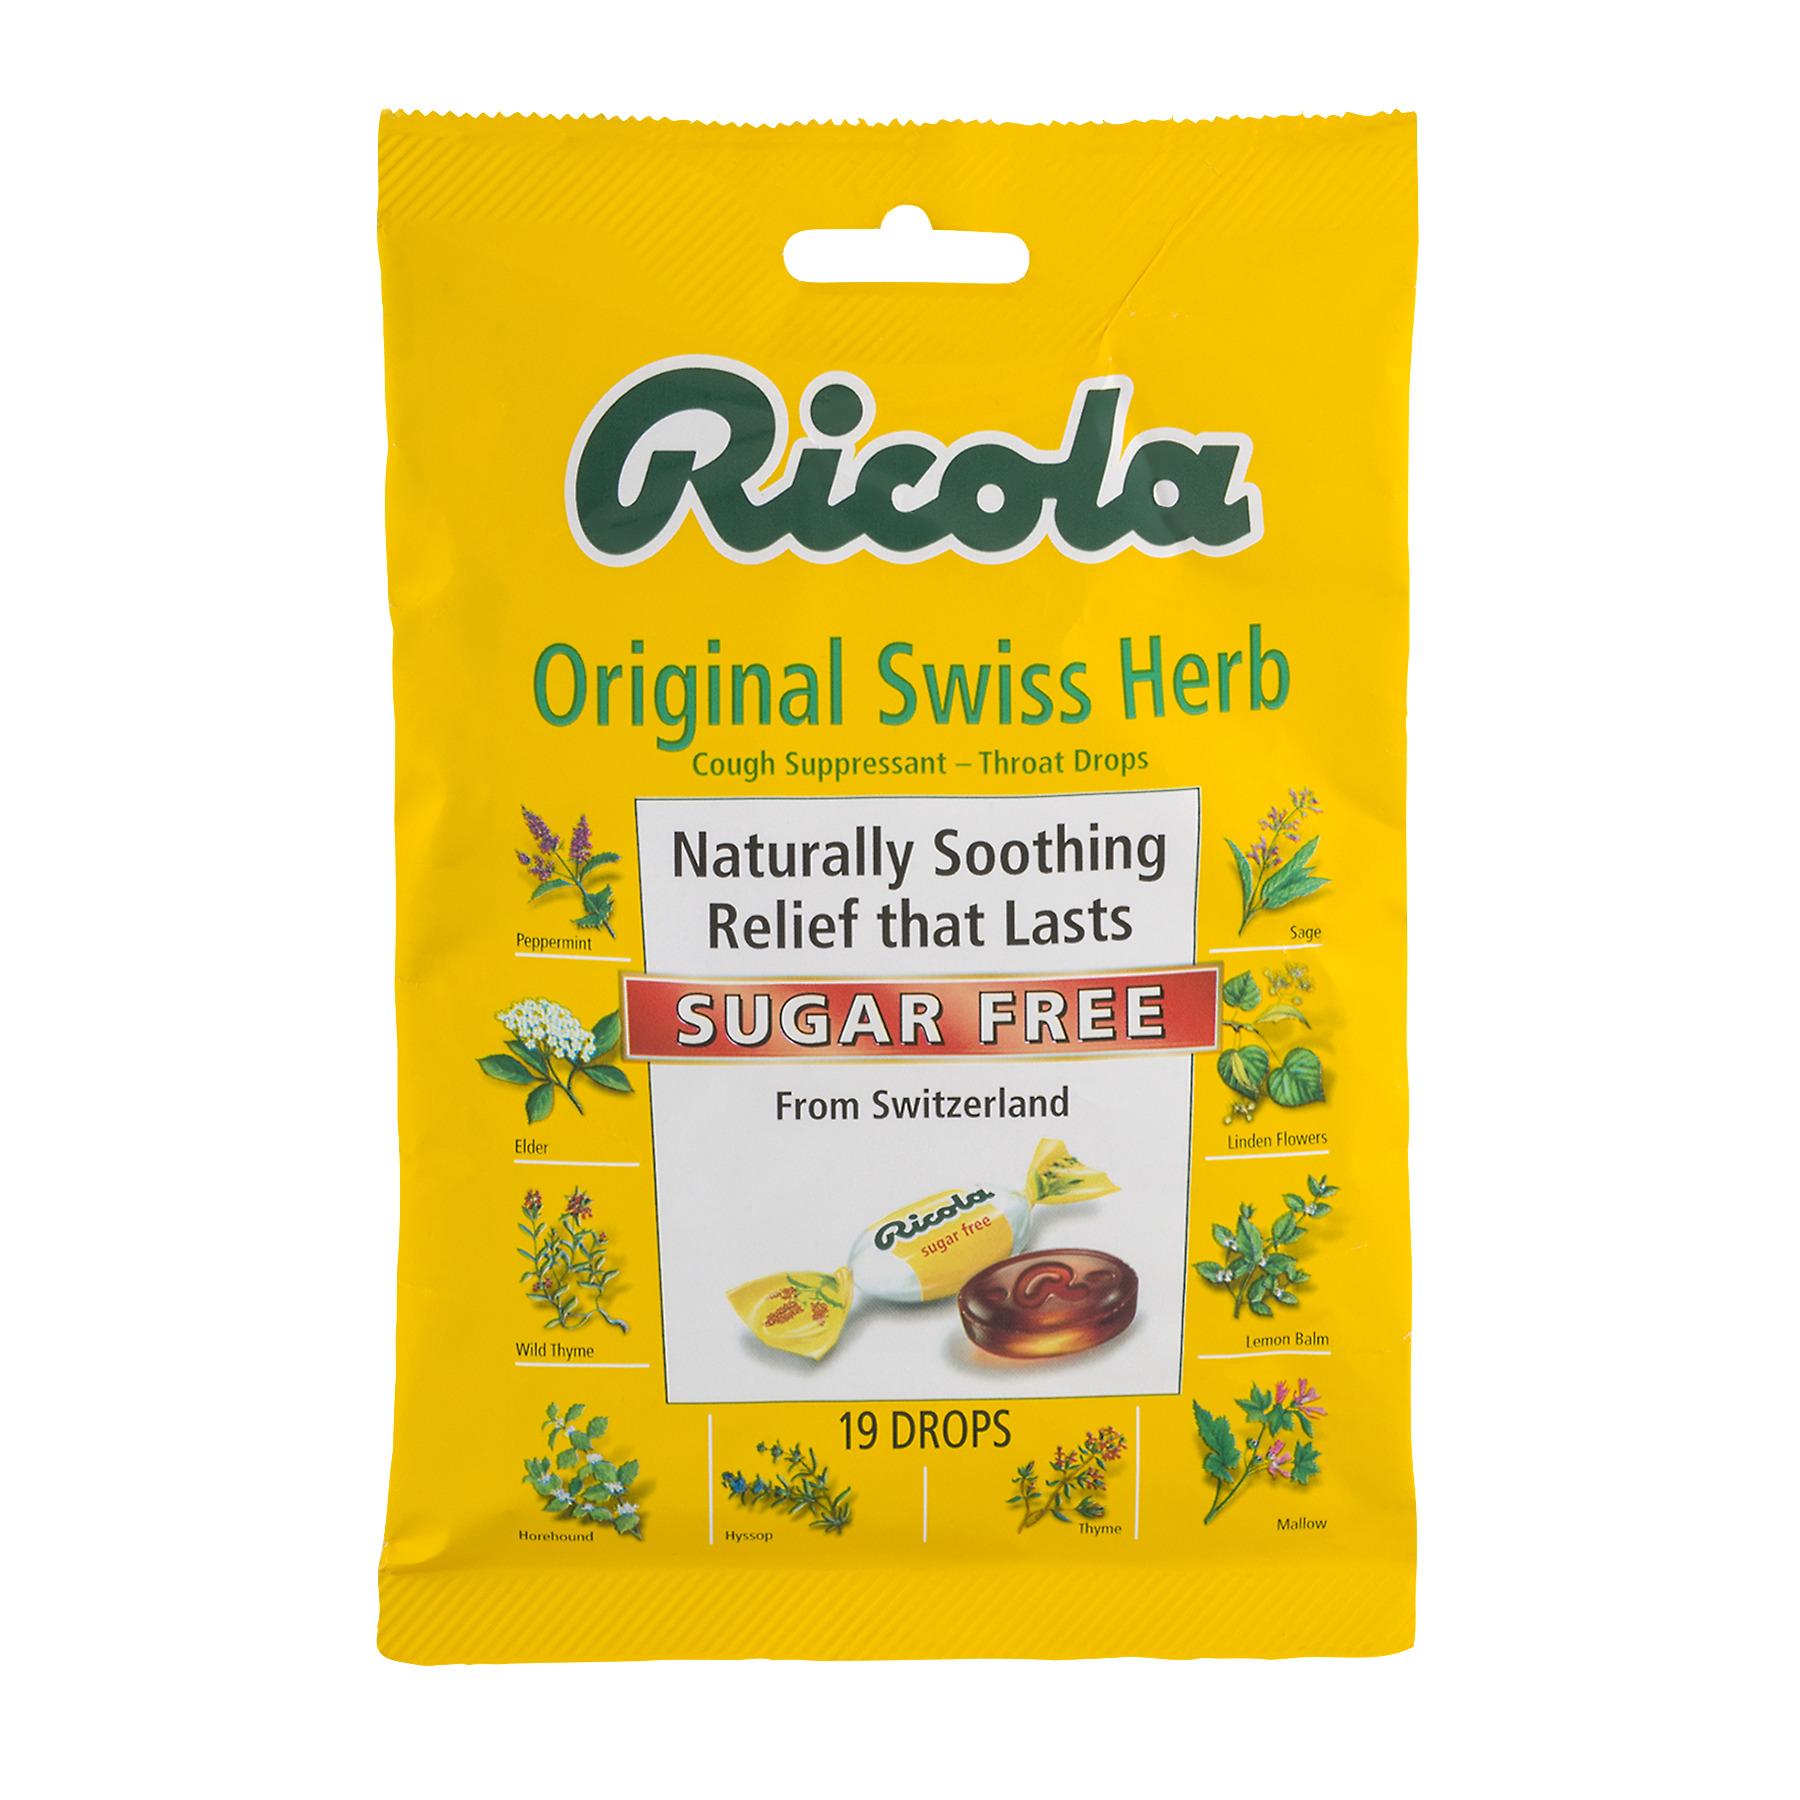 Ricola Herb Cough Suppressant Throat Drops Original Swiss Herb Sugar Free - 19 CT19.0 CT